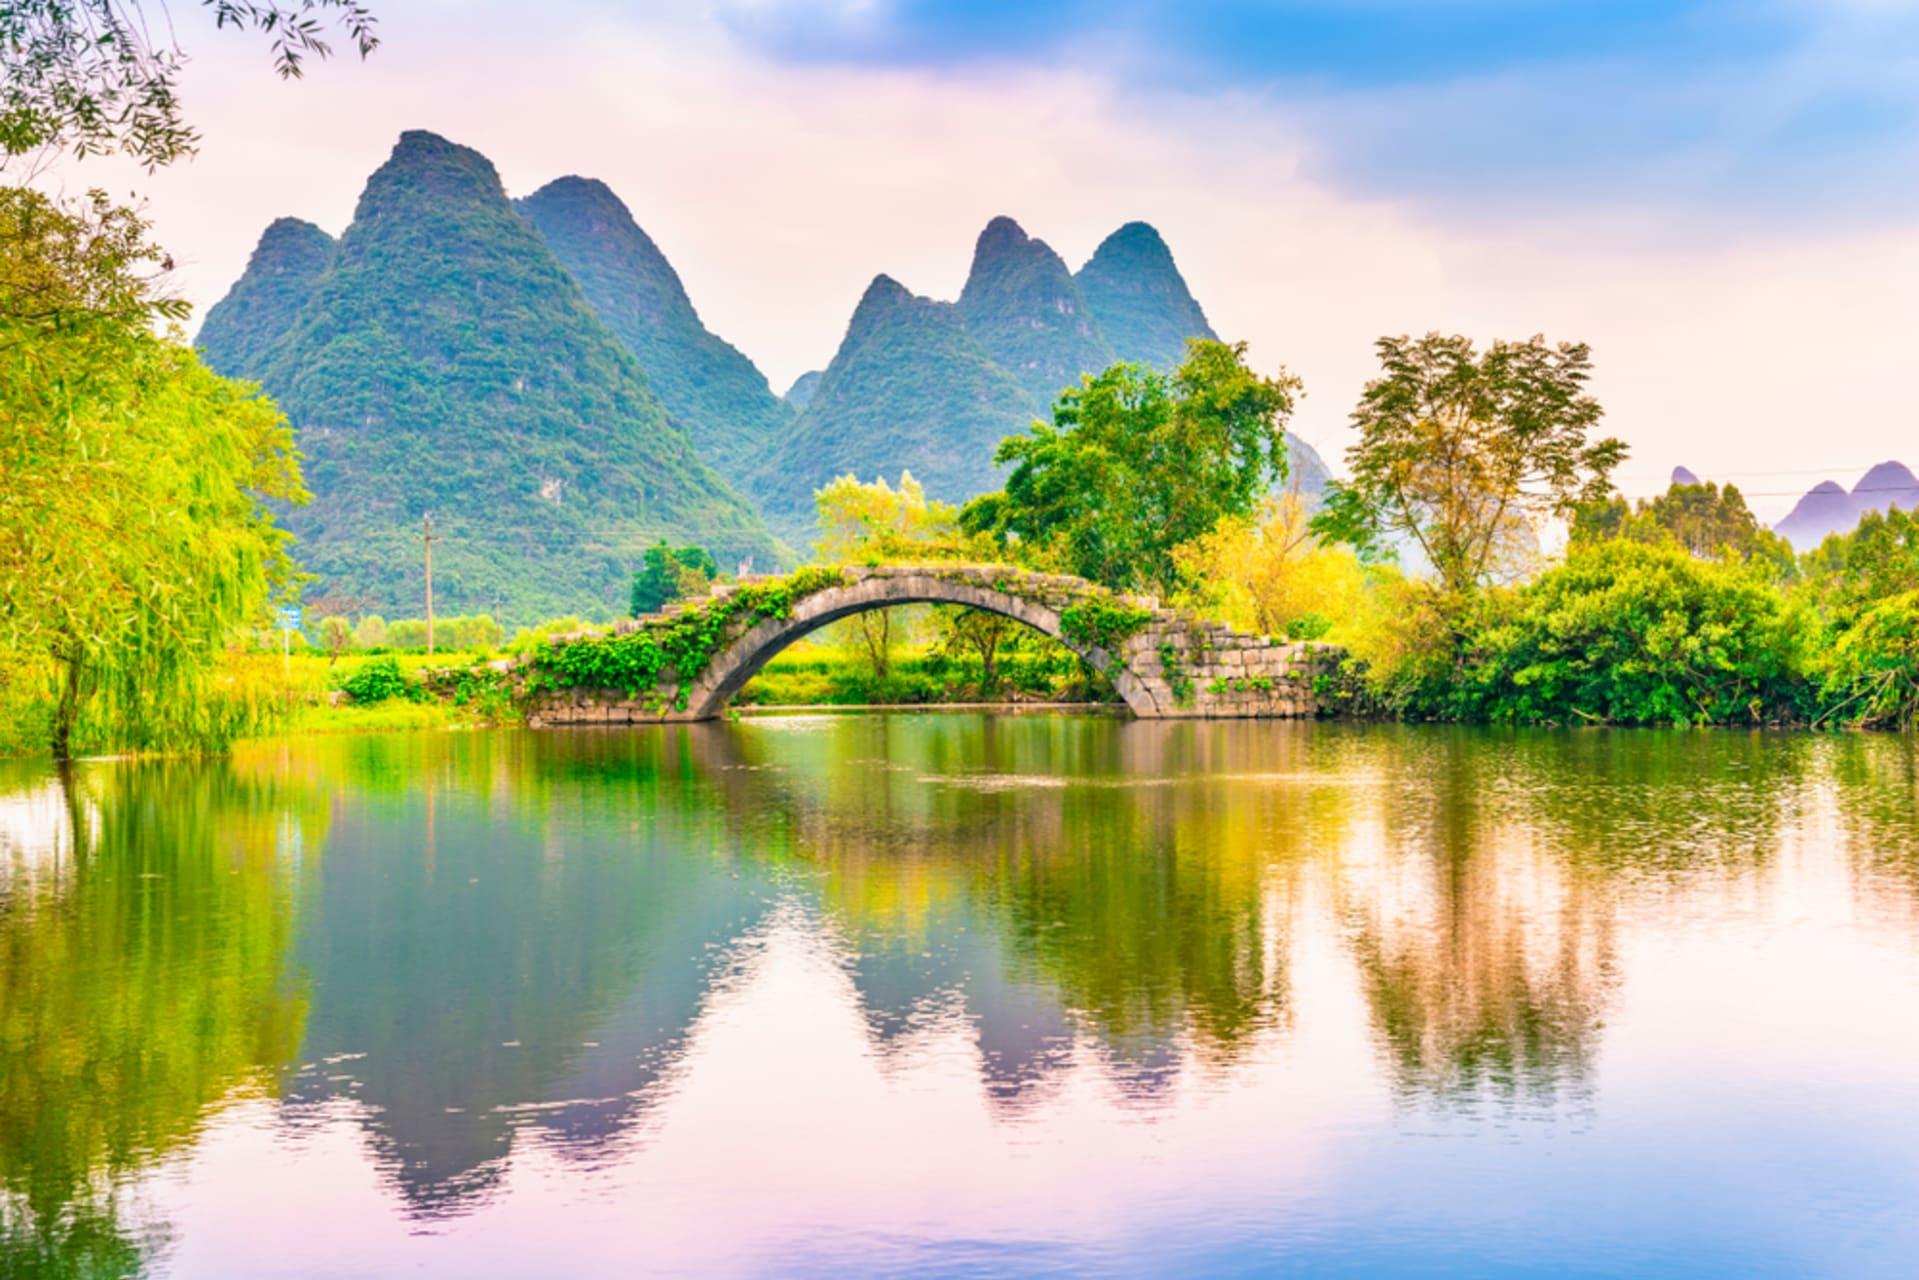 Guilin - Yangshuo County: Natural Rural Beauty